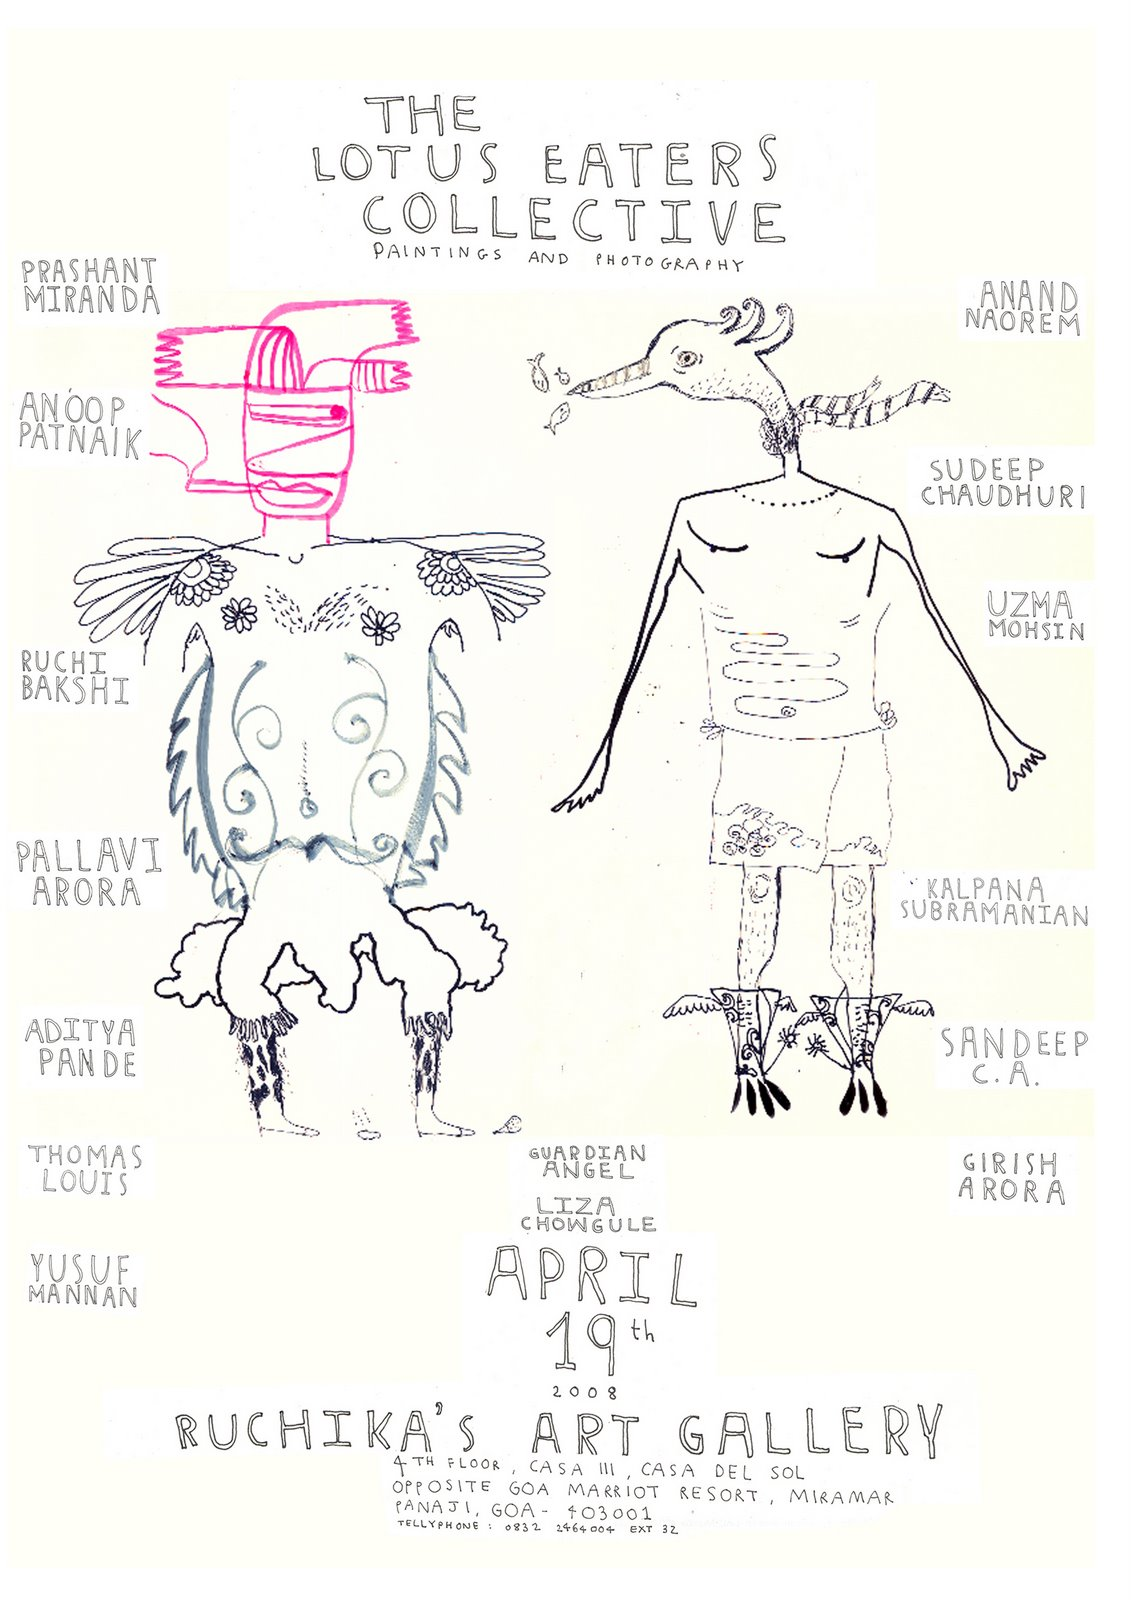 goa show - april 2008